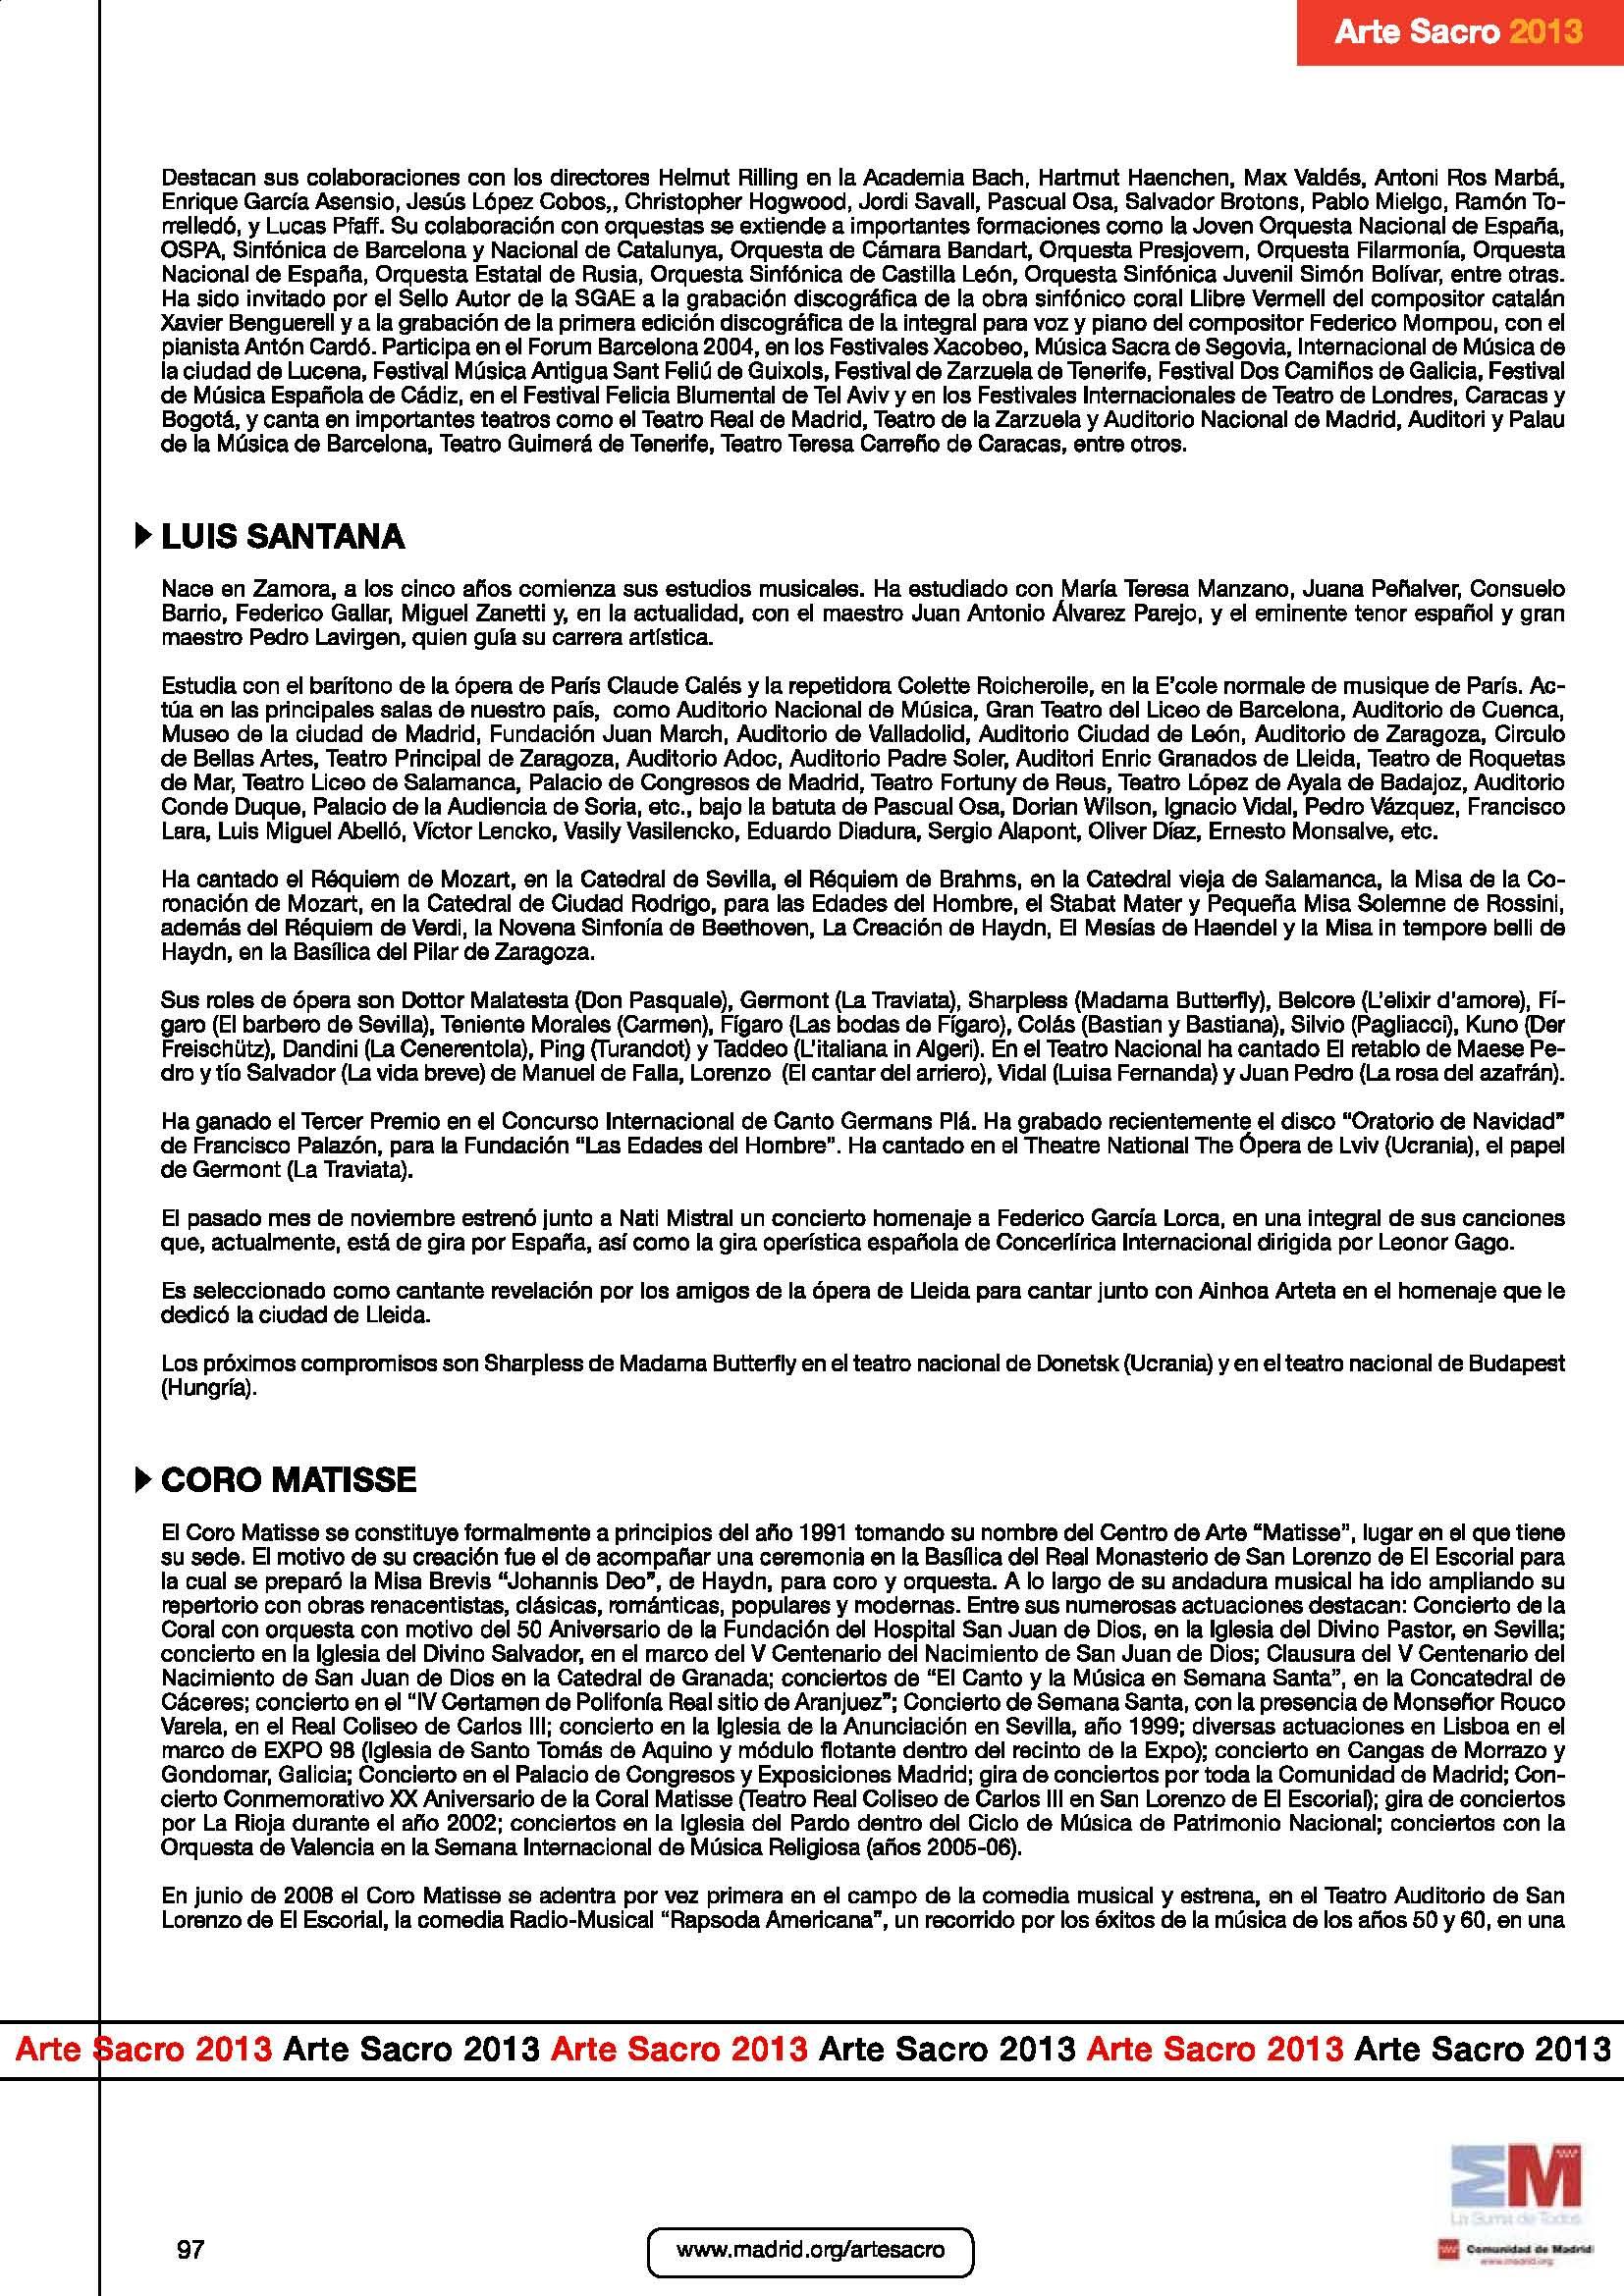 dossier_completo_Página_097